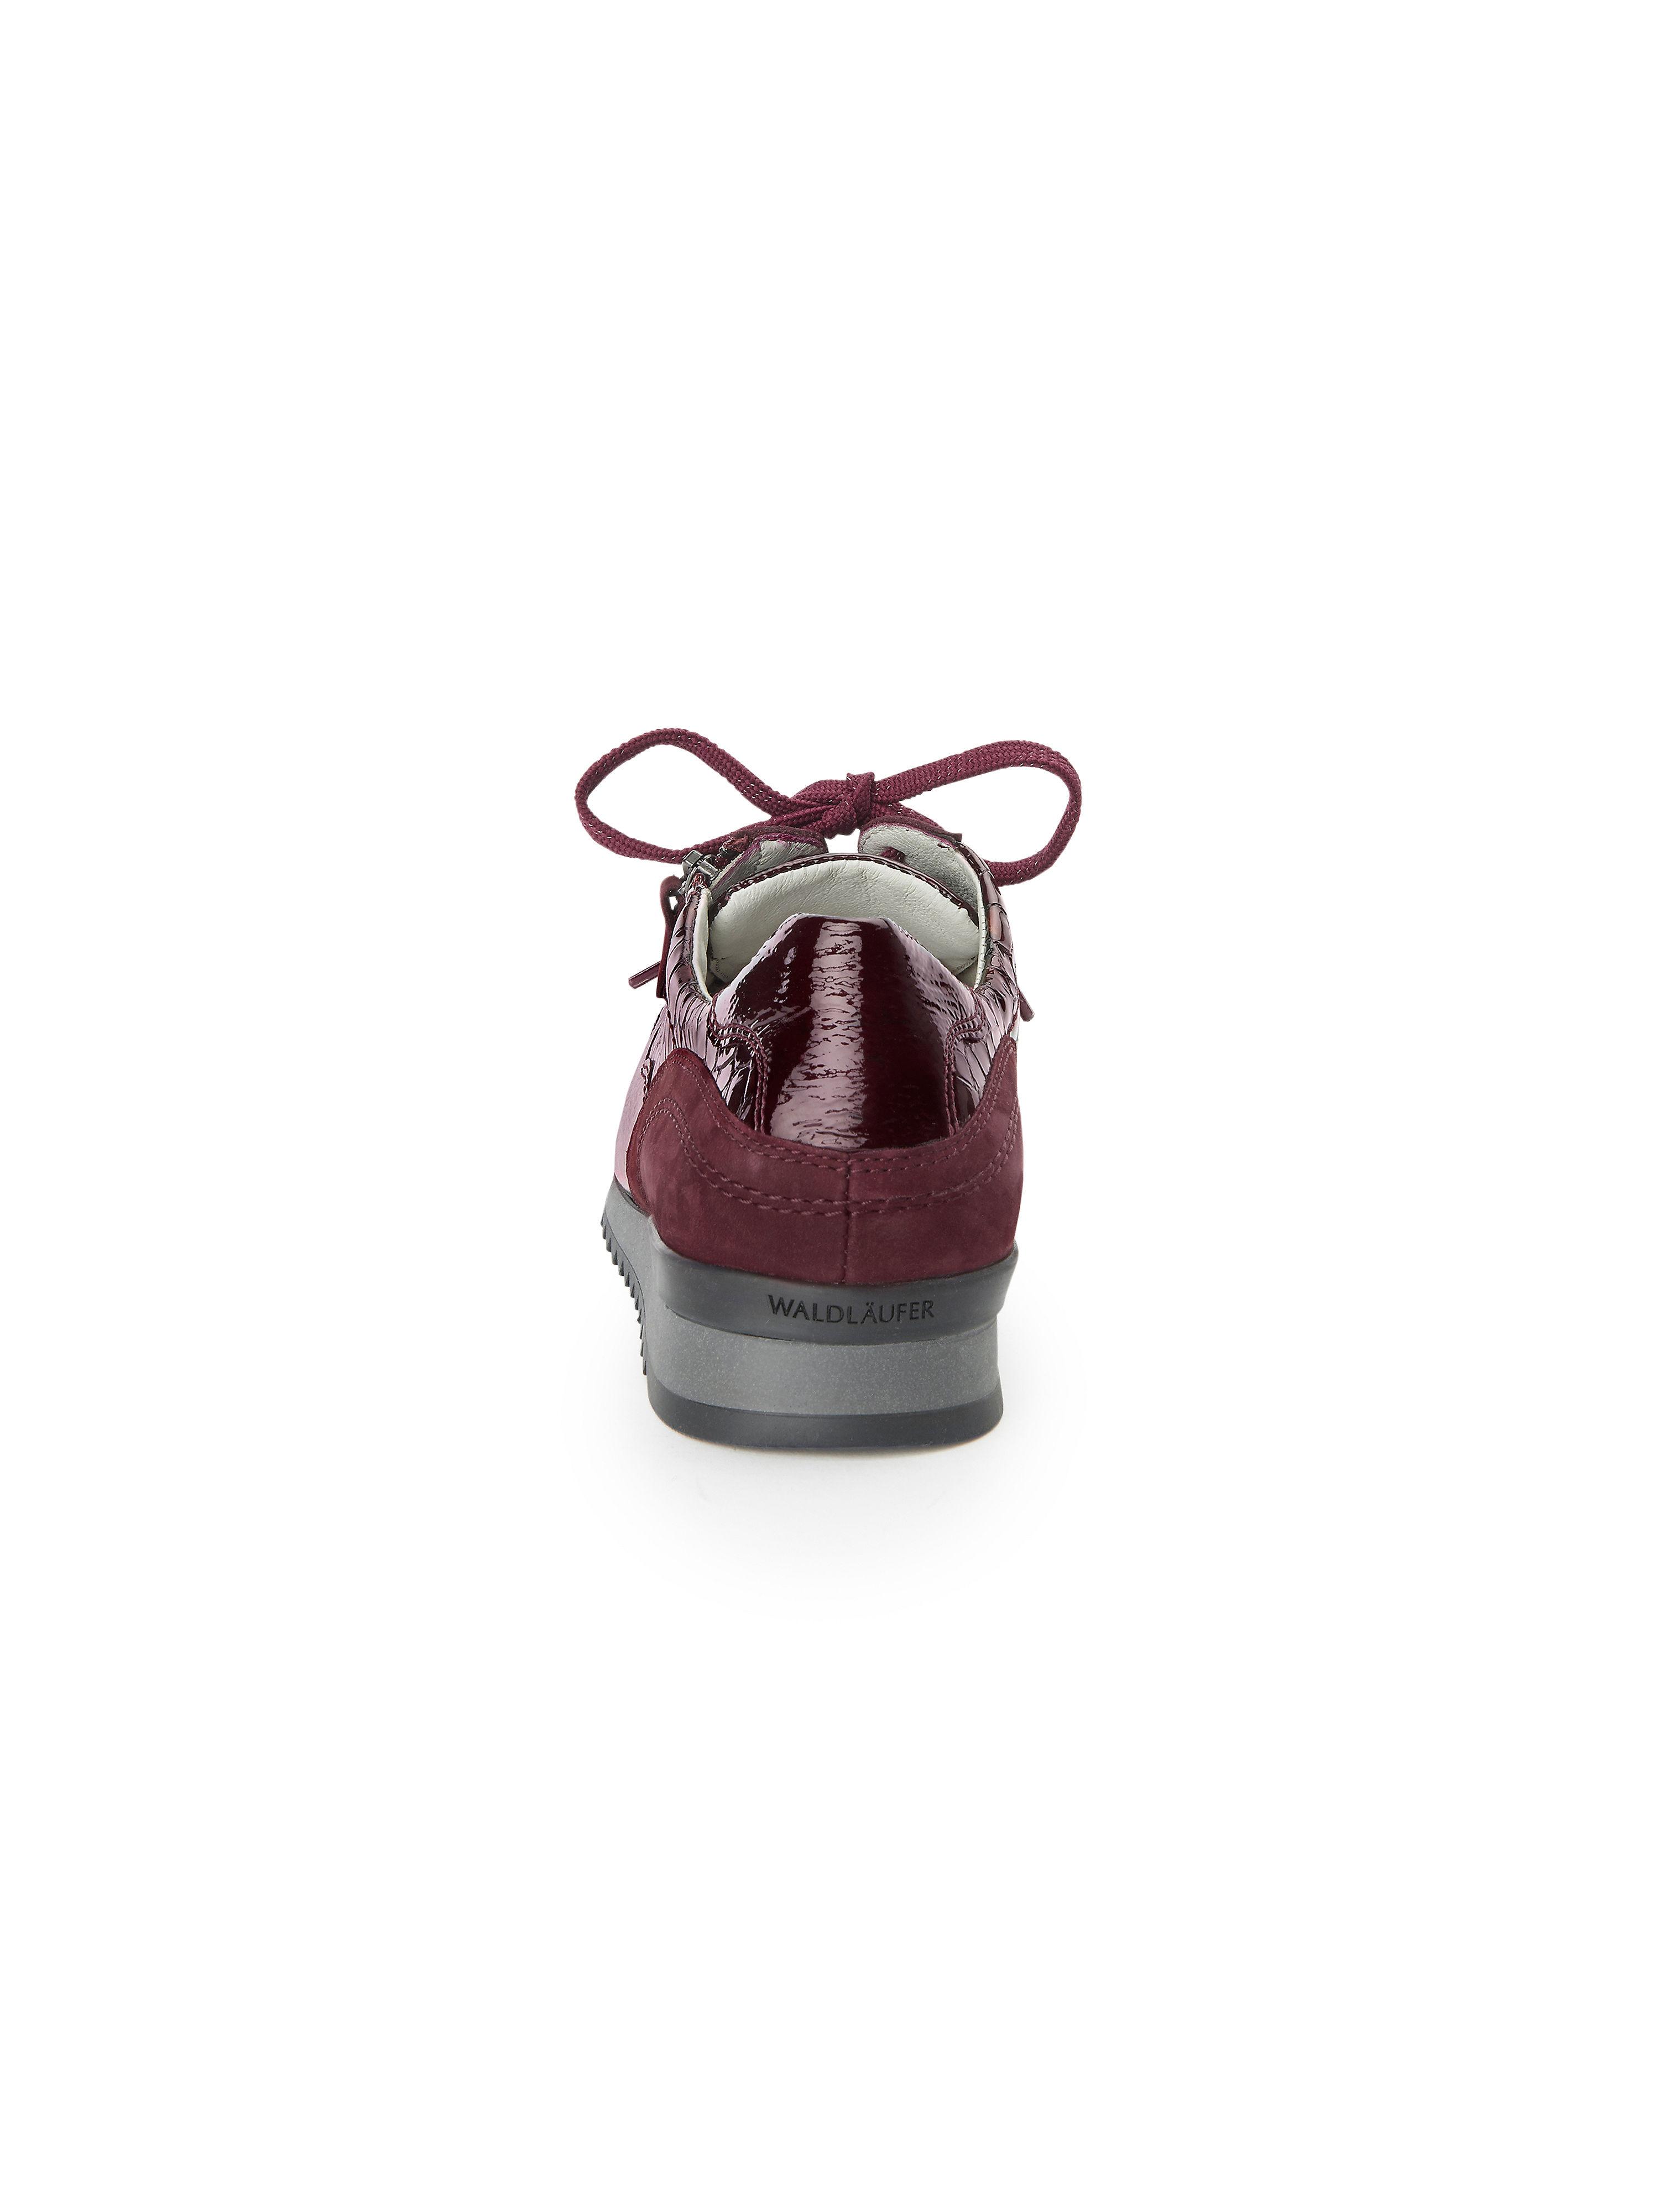 Waldläufer - Sneaker Hurly aus 100% Leder - Schuhe Bordeaux Gute Qualität beliebte Schuhe - c1bb56